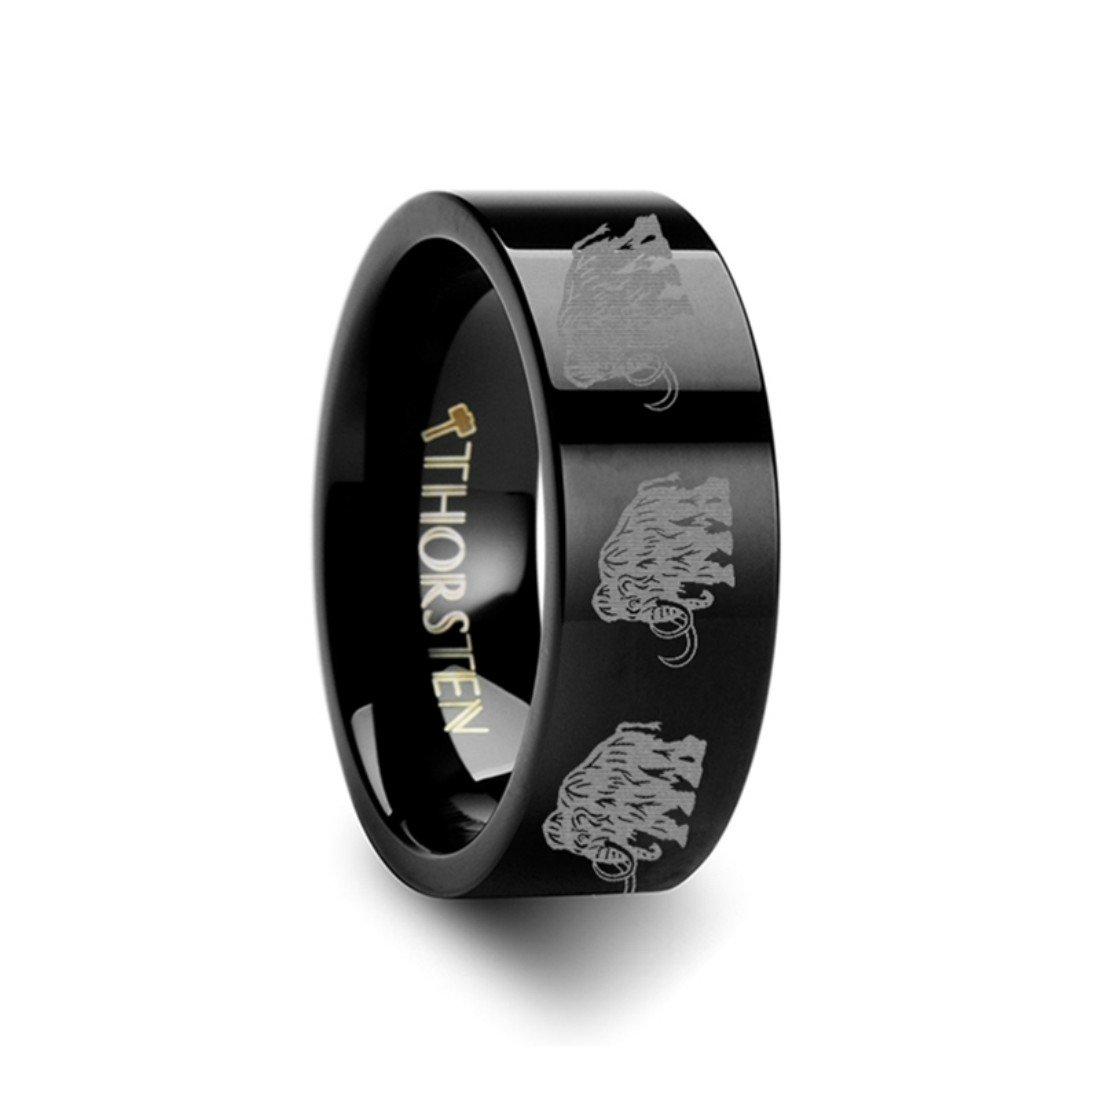 Thorsten Dinosaur Ring Woolly Mammoth Prehistoric Paleo Flat Black Tungsten Ring 12mm Wide Wedding Band from Roy Rose Jewelry